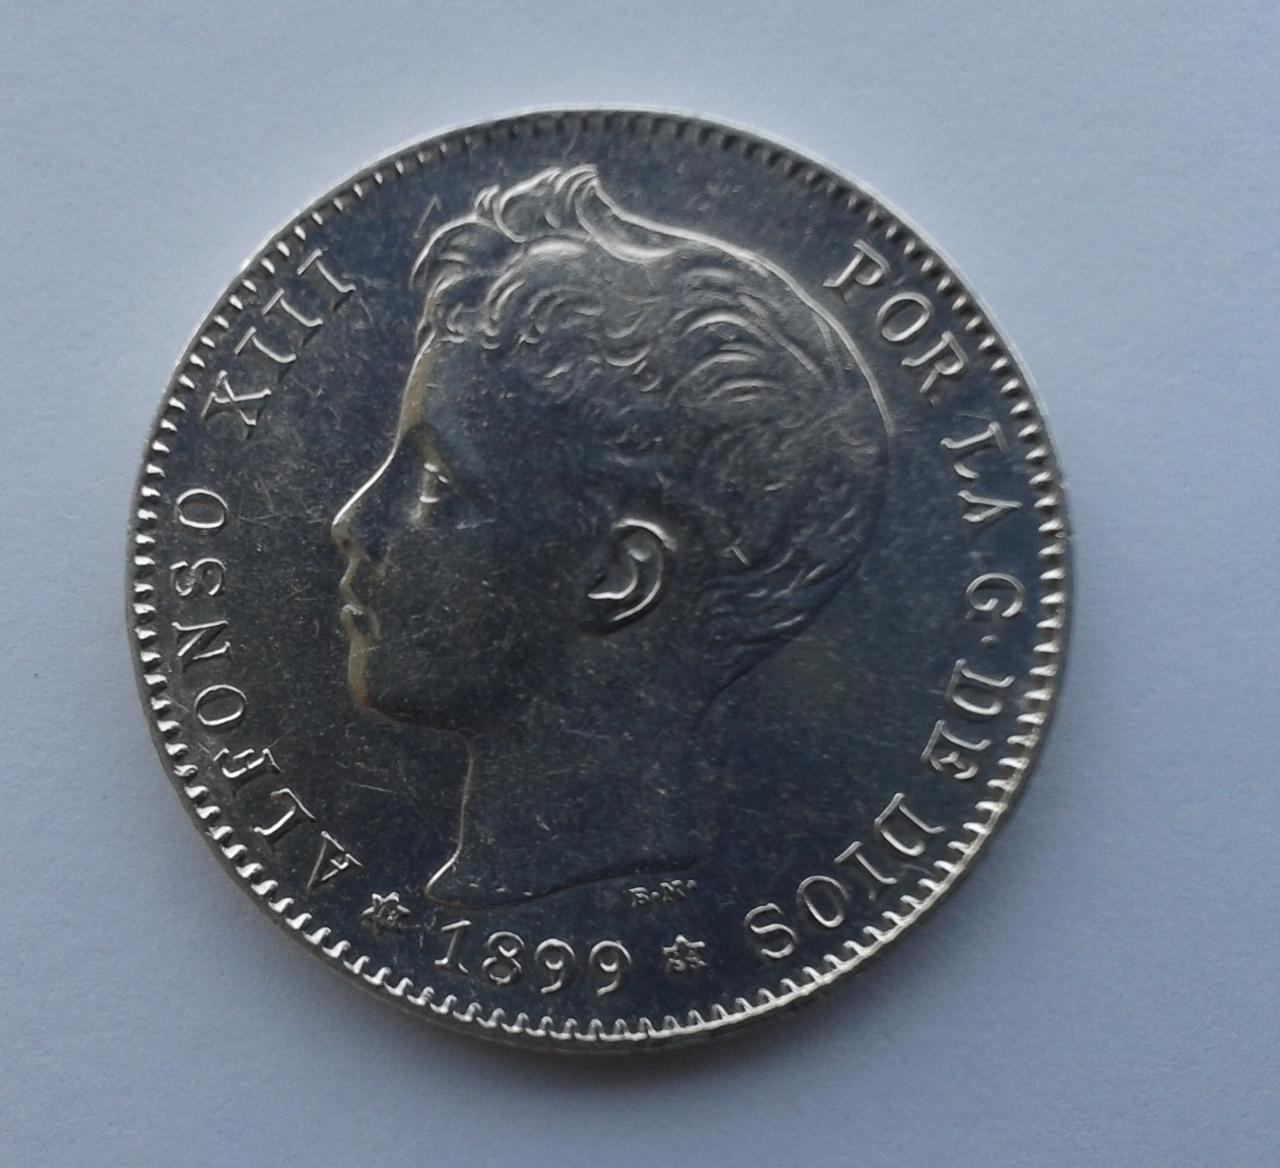 1 peseta 1899 - Alfonso XIII 20141028_152440